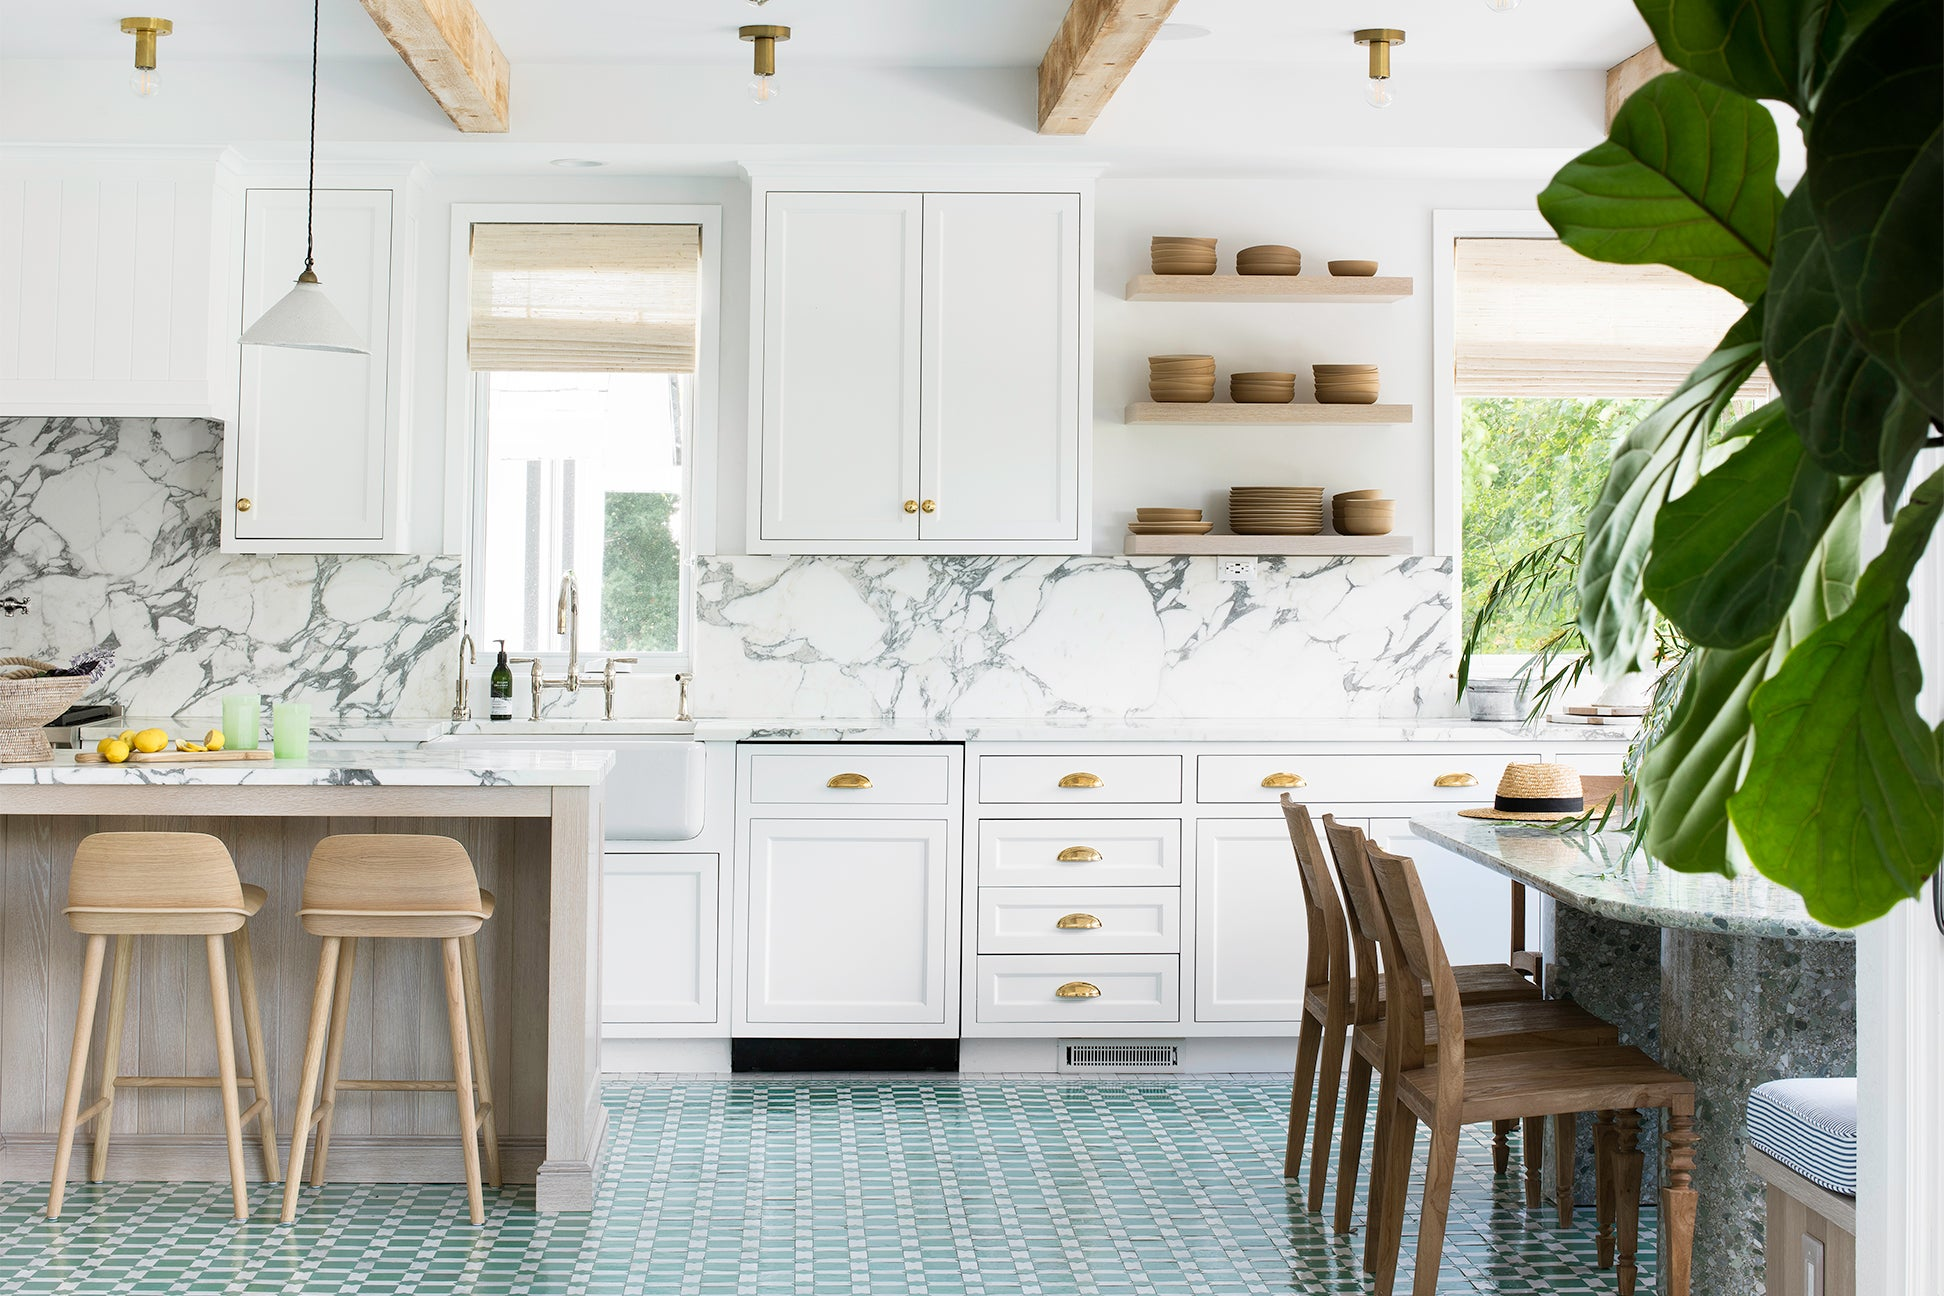 seafoam green floors and white kitchen